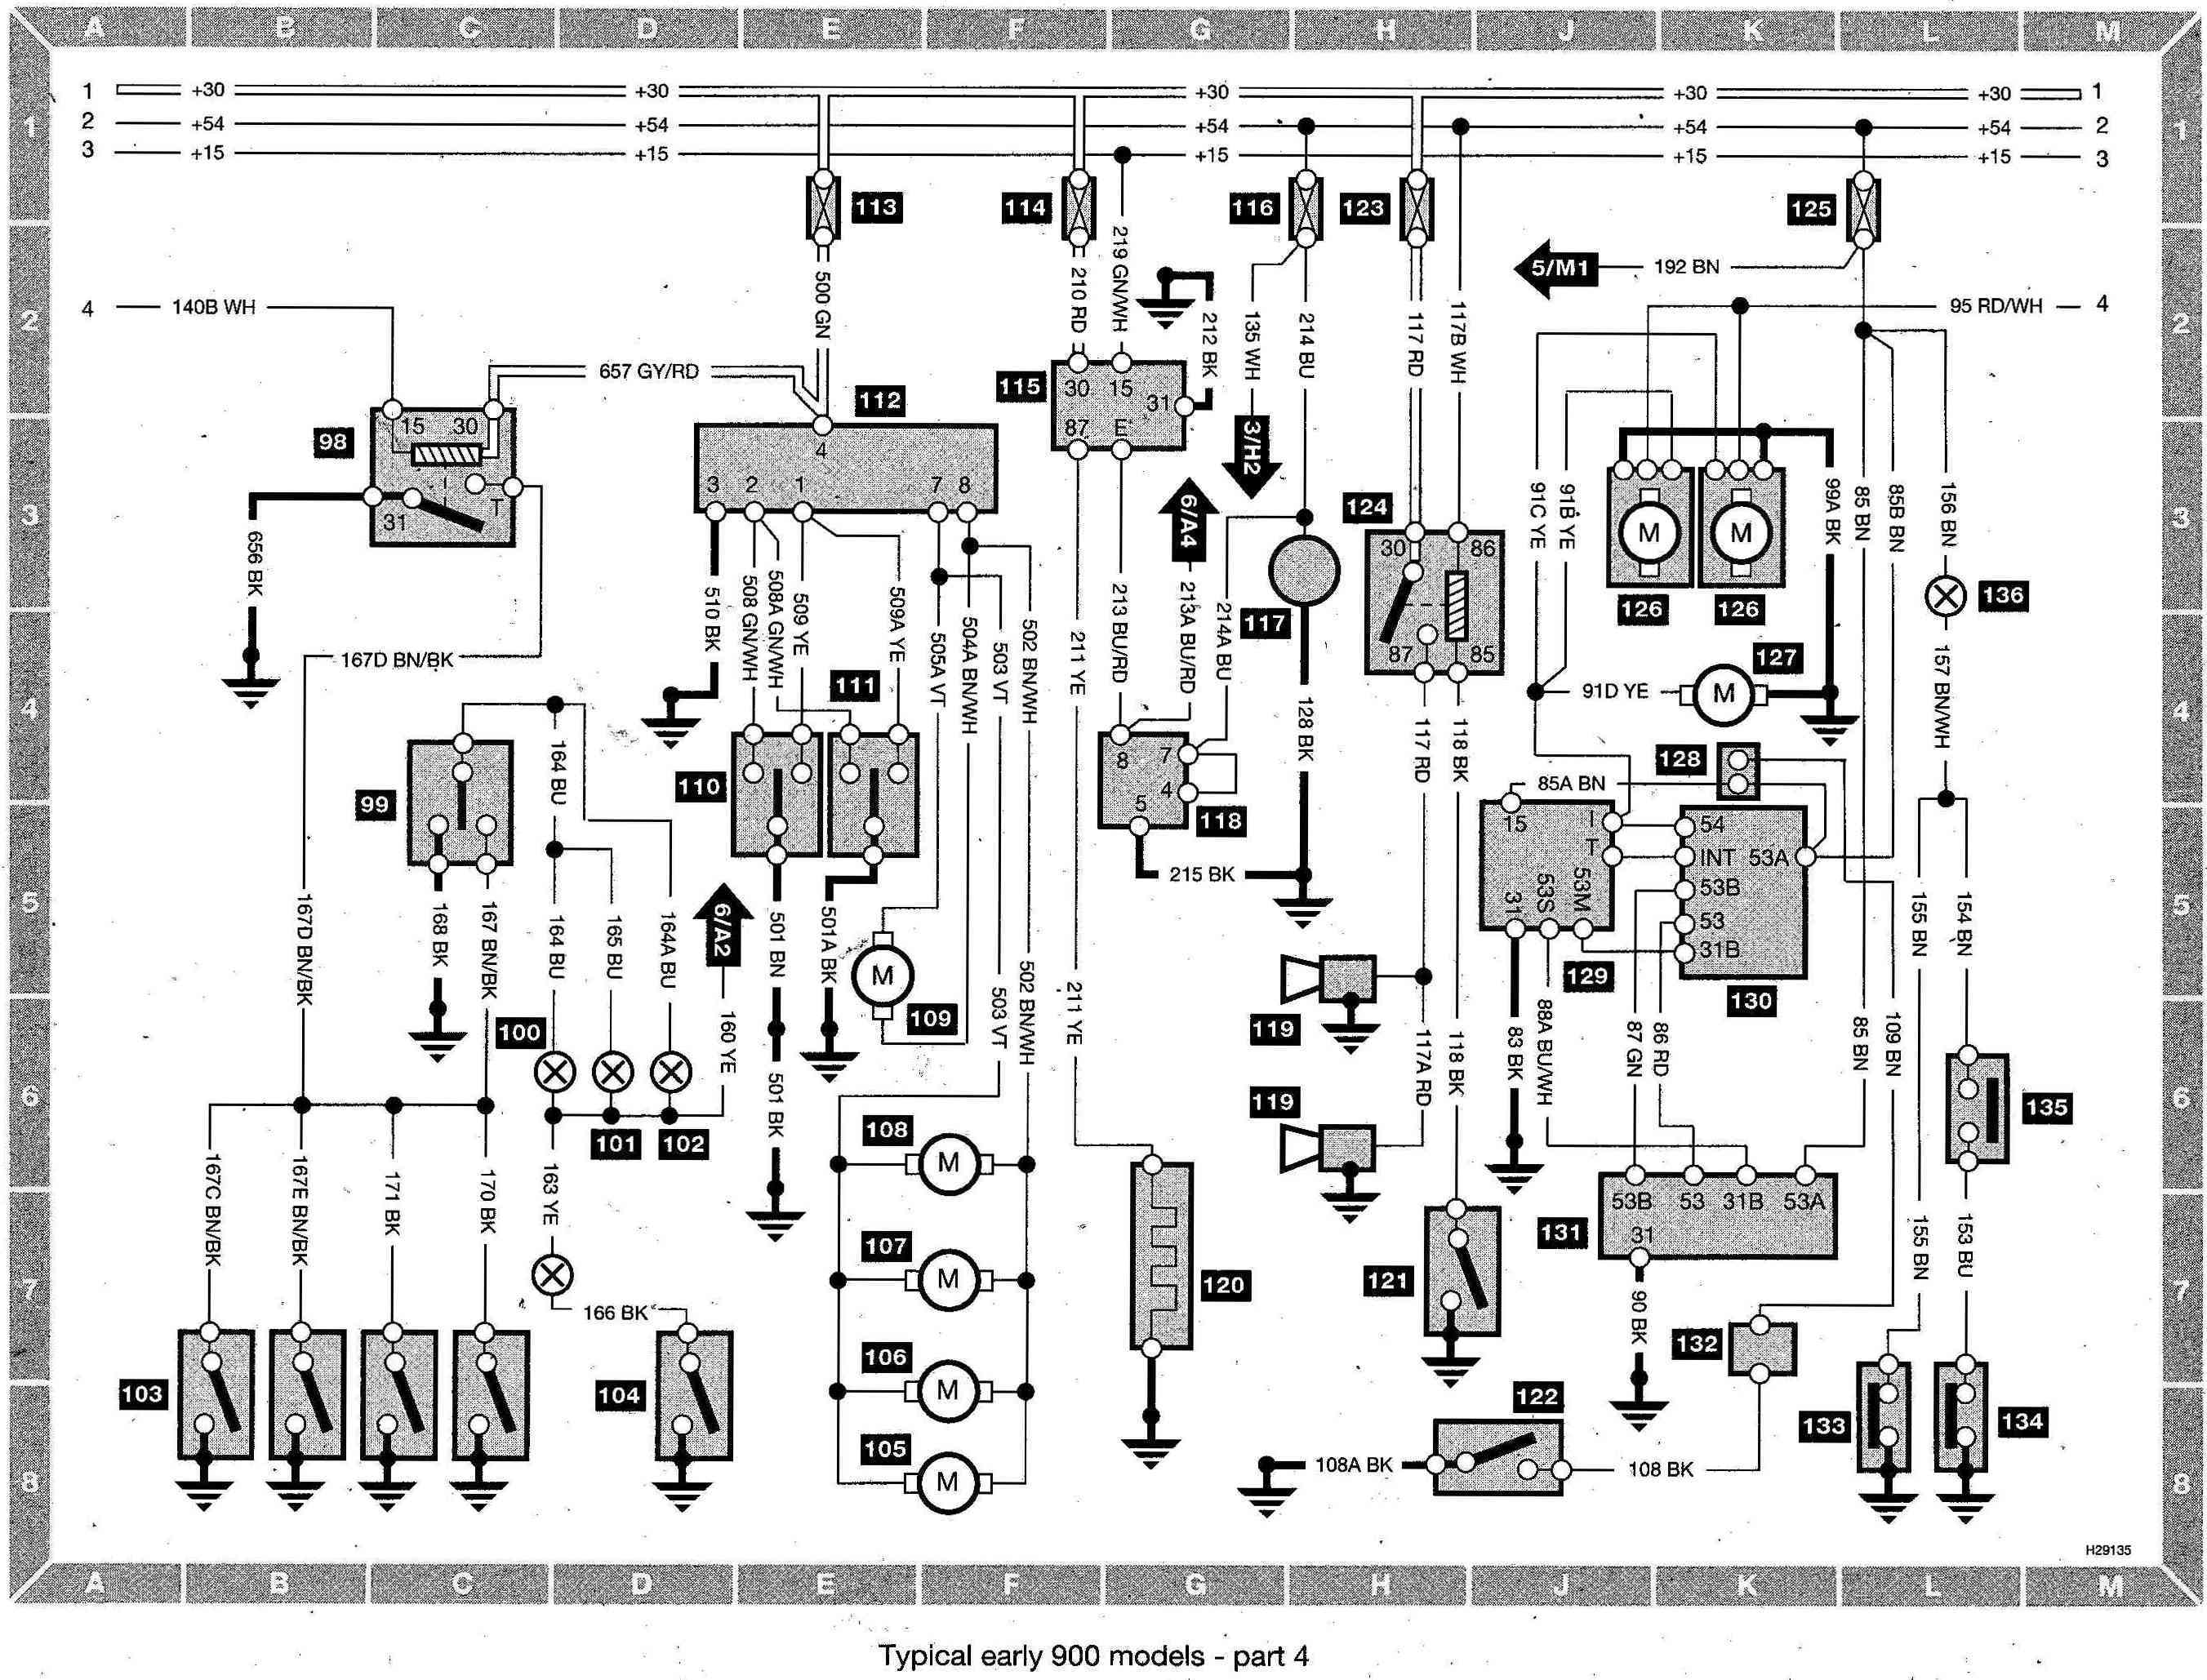 Saab 9000 Air Conditioning Wiring Diagram - Wiring Diagram Direct  camp-demand - camp-demand.siciliabeb.it | Wiring Diagram For 1997 Saab 900 |  | camp-demand.siciliabeb.it